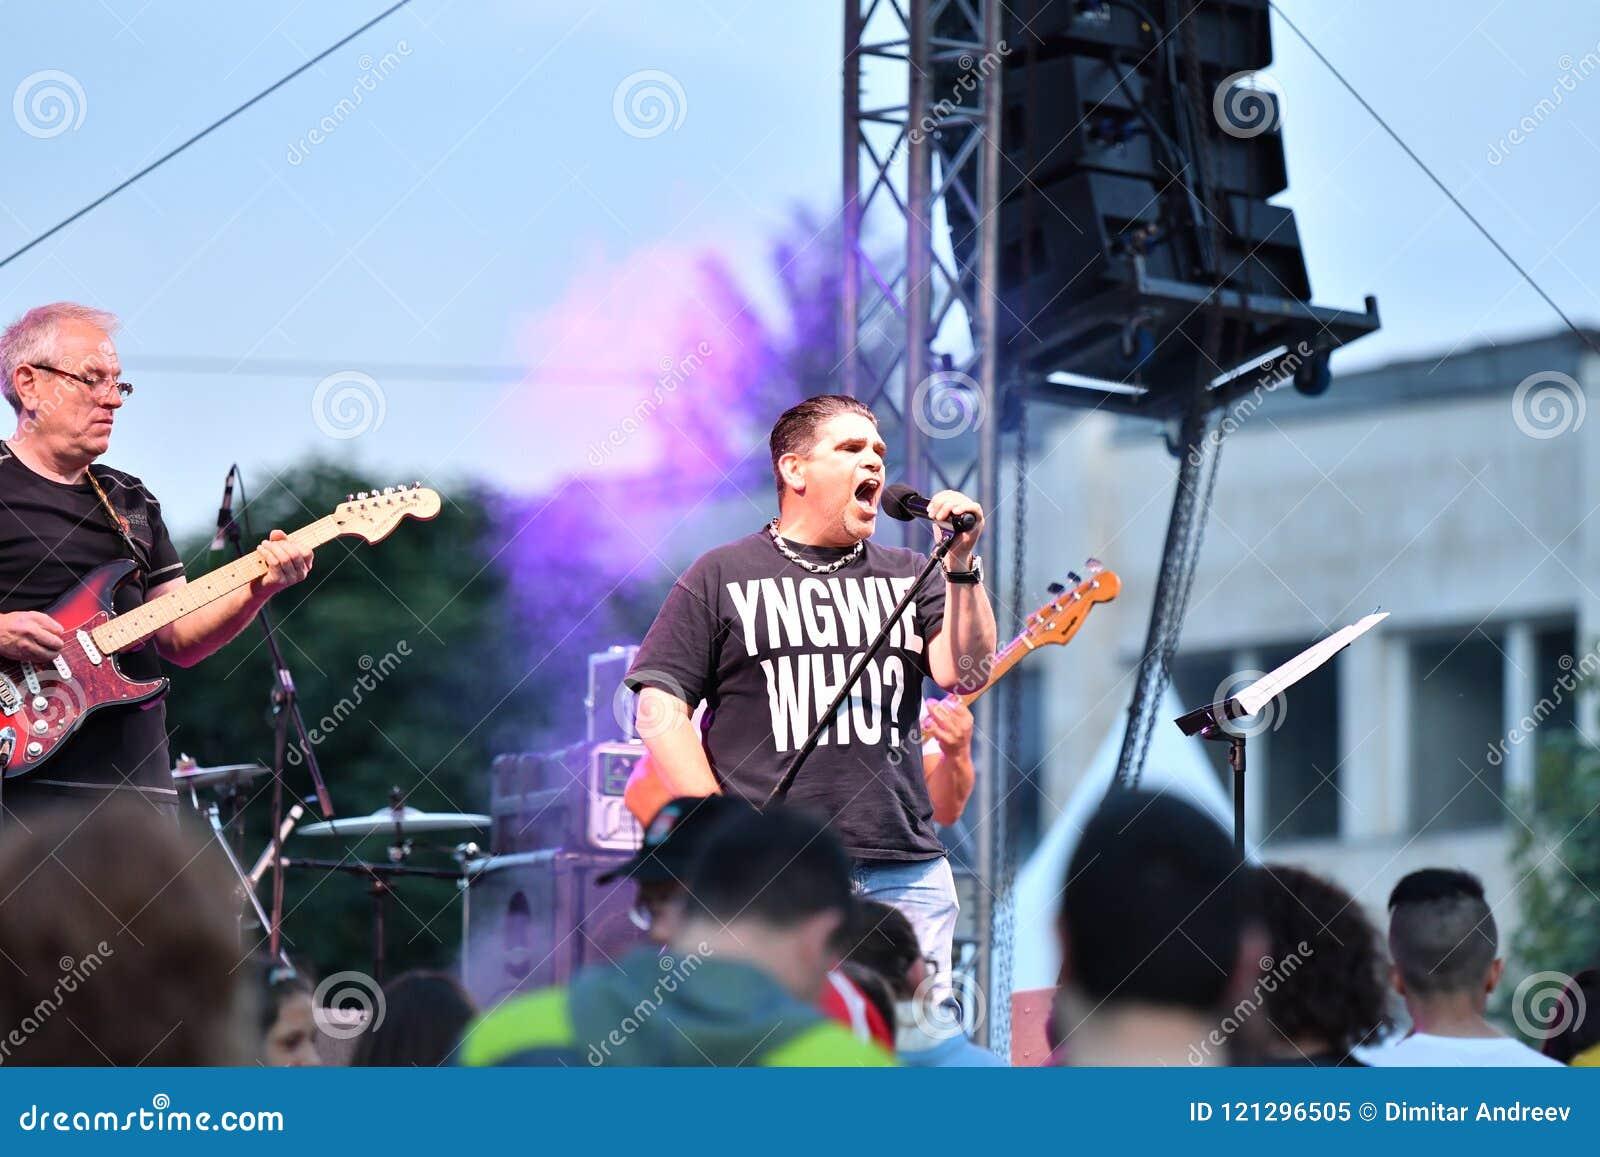 19/05/2018 Panagiurishte, Bulgaria  Rock Band  Editorial Image